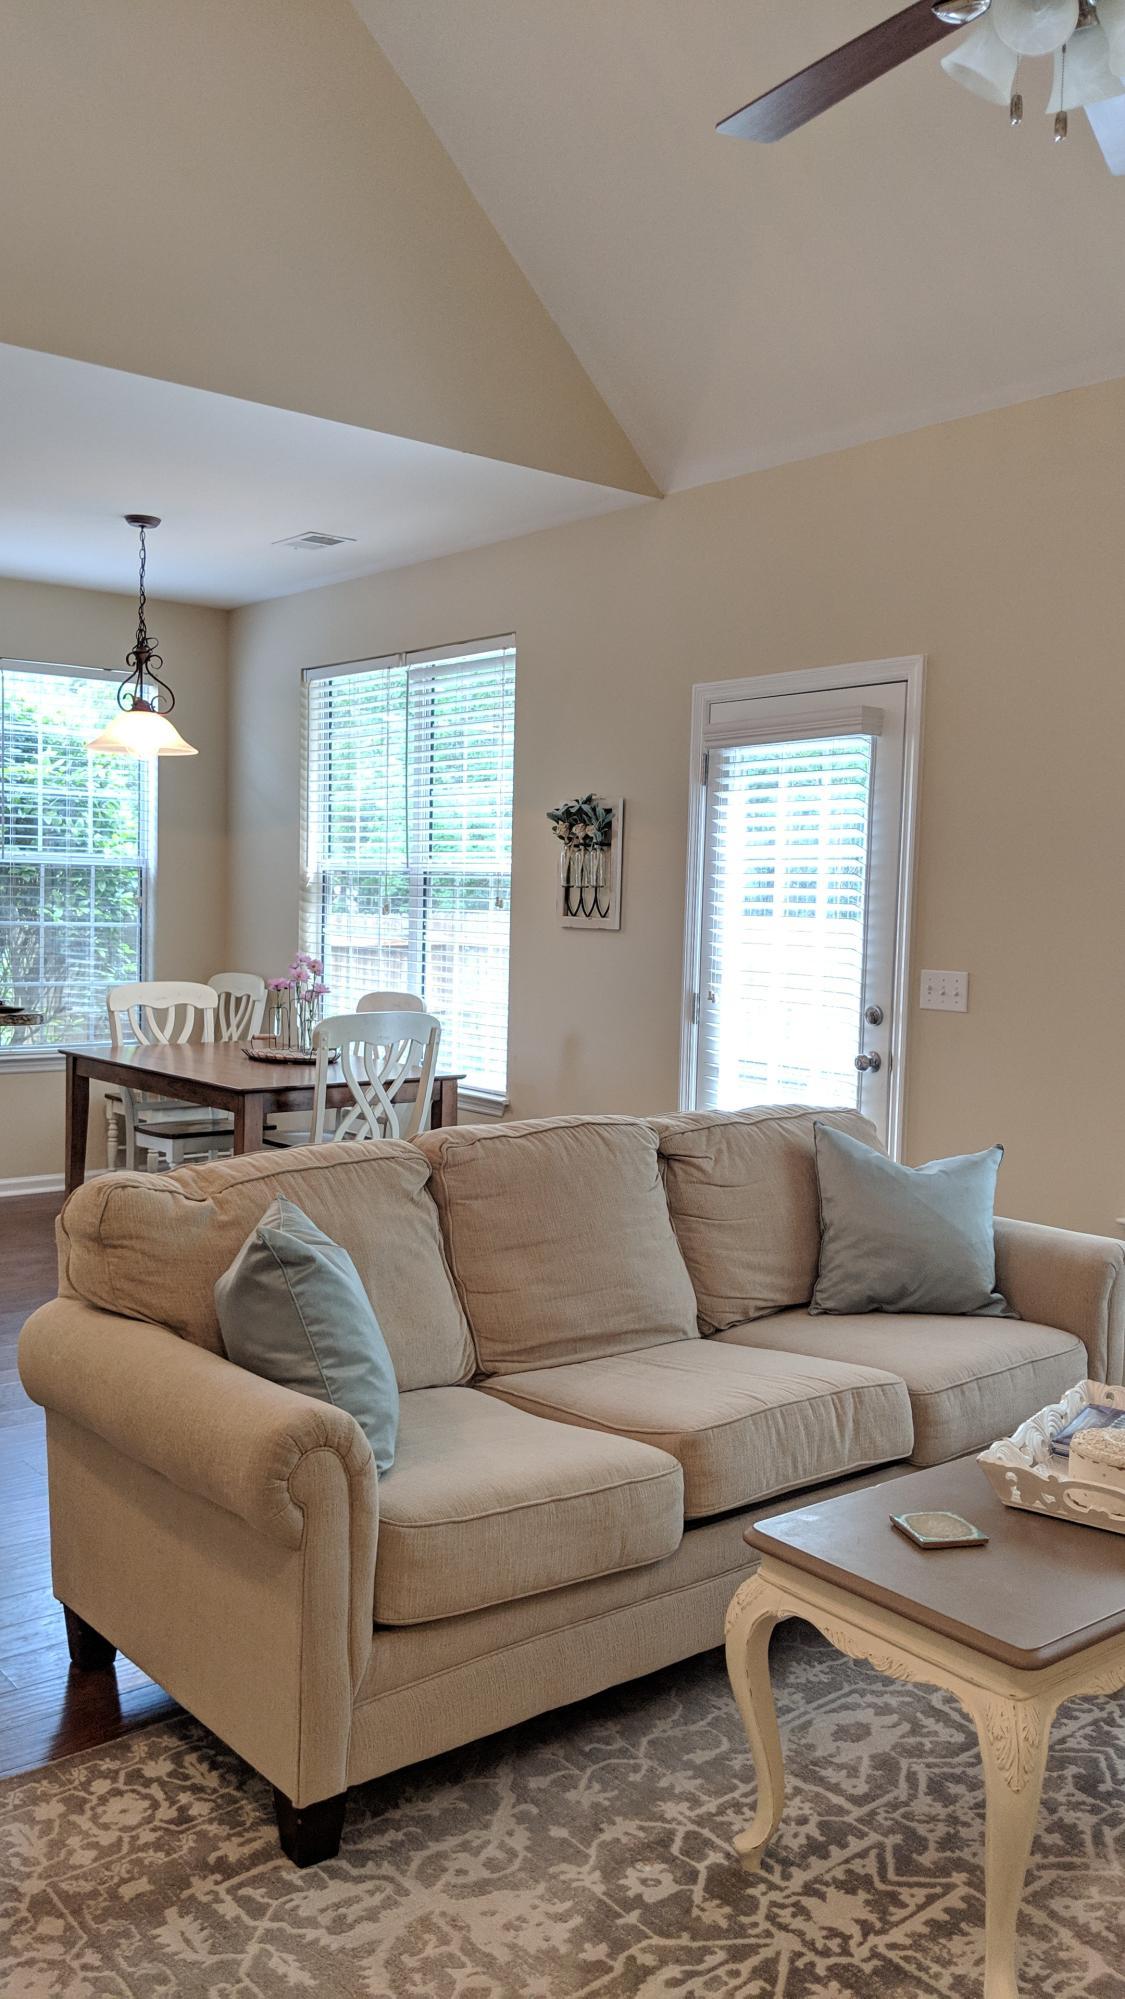 Park West Homes For Sale - 1337 Heidiho, Mount Pleasant, SC - 50